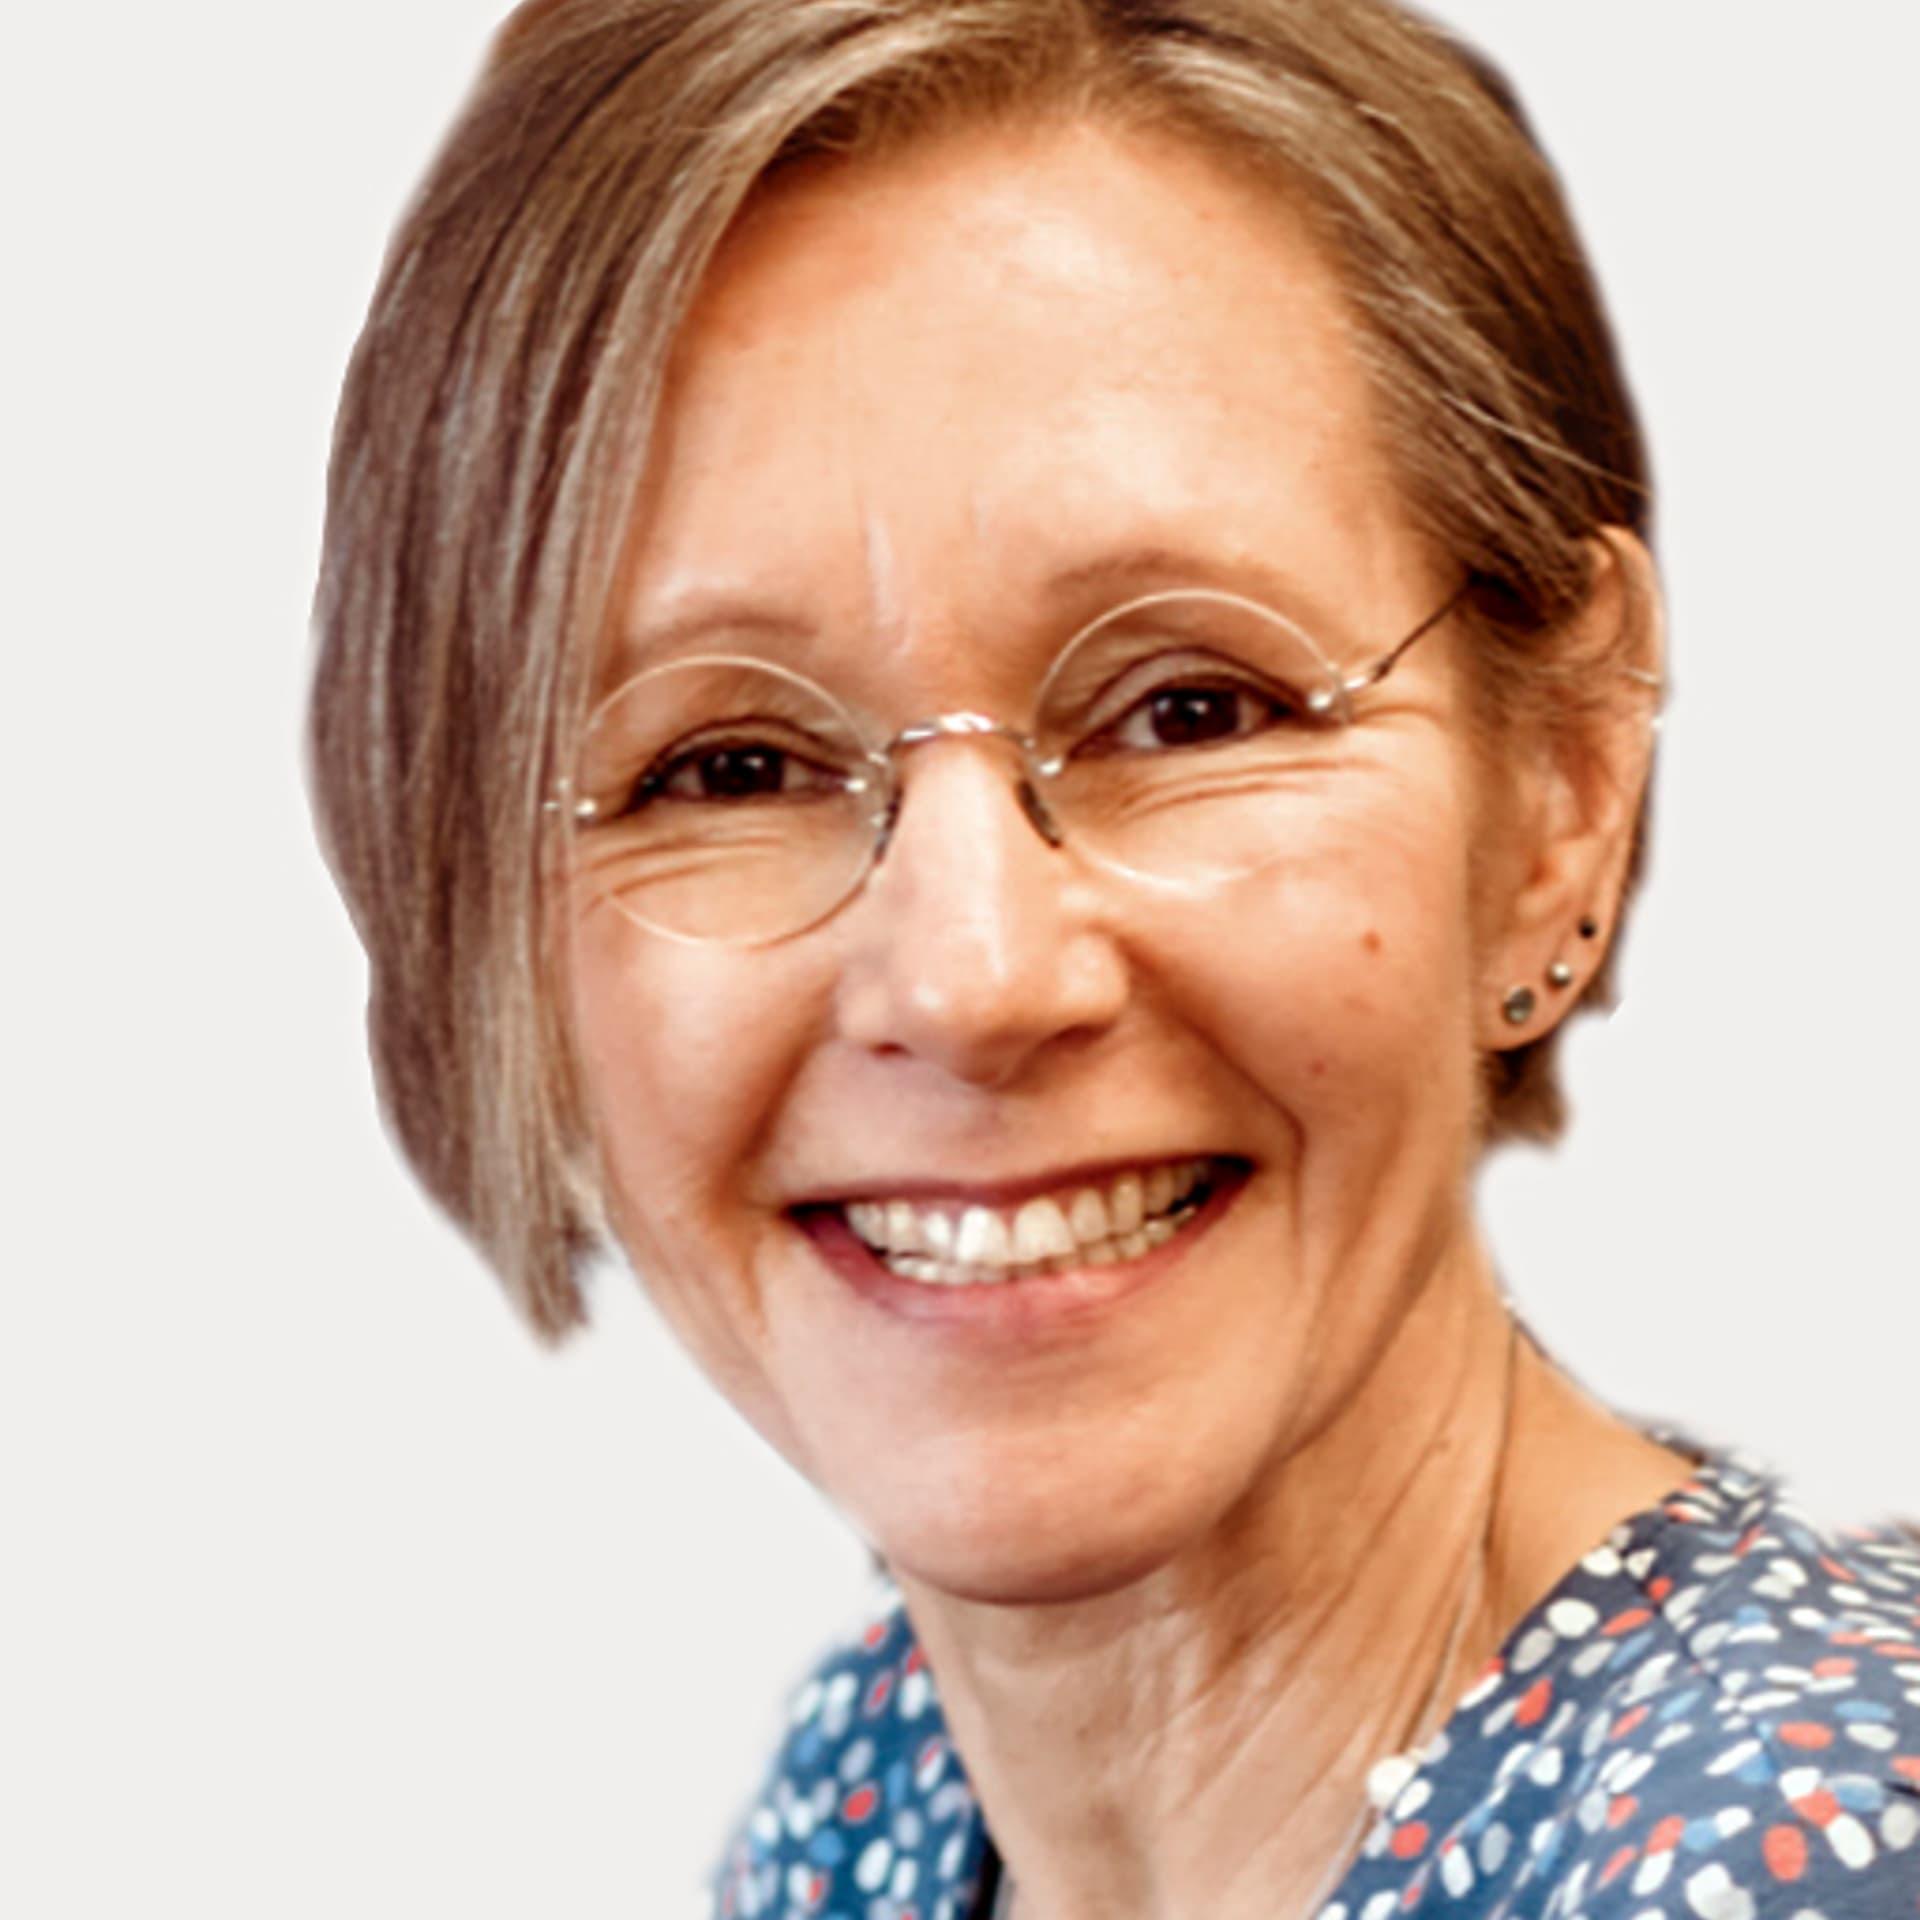 Frauke Werner